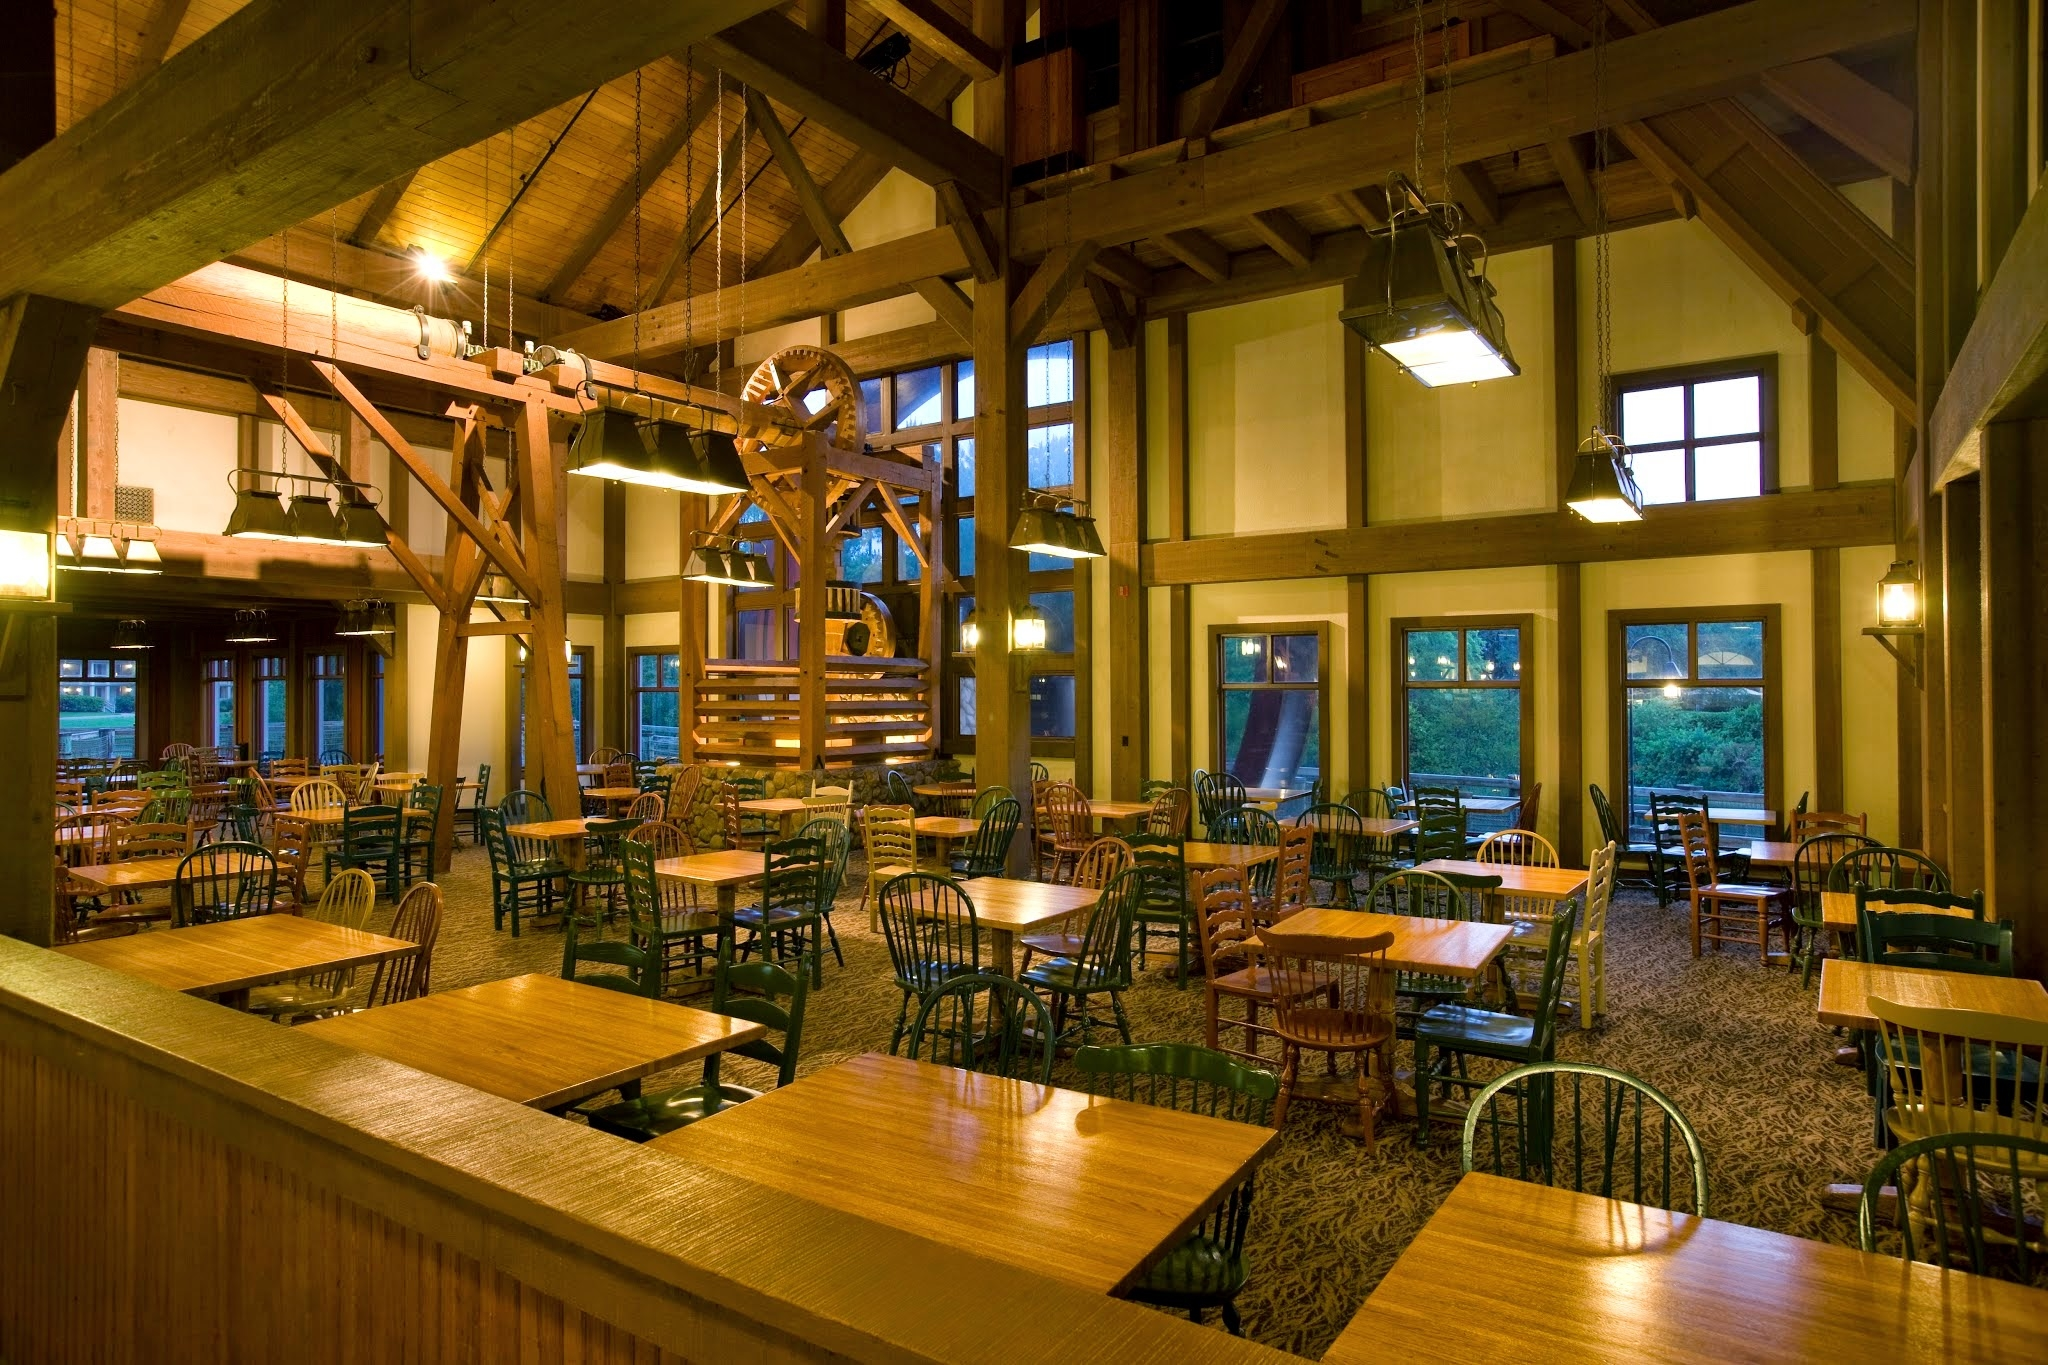 Riverside Mill Food Court image 4